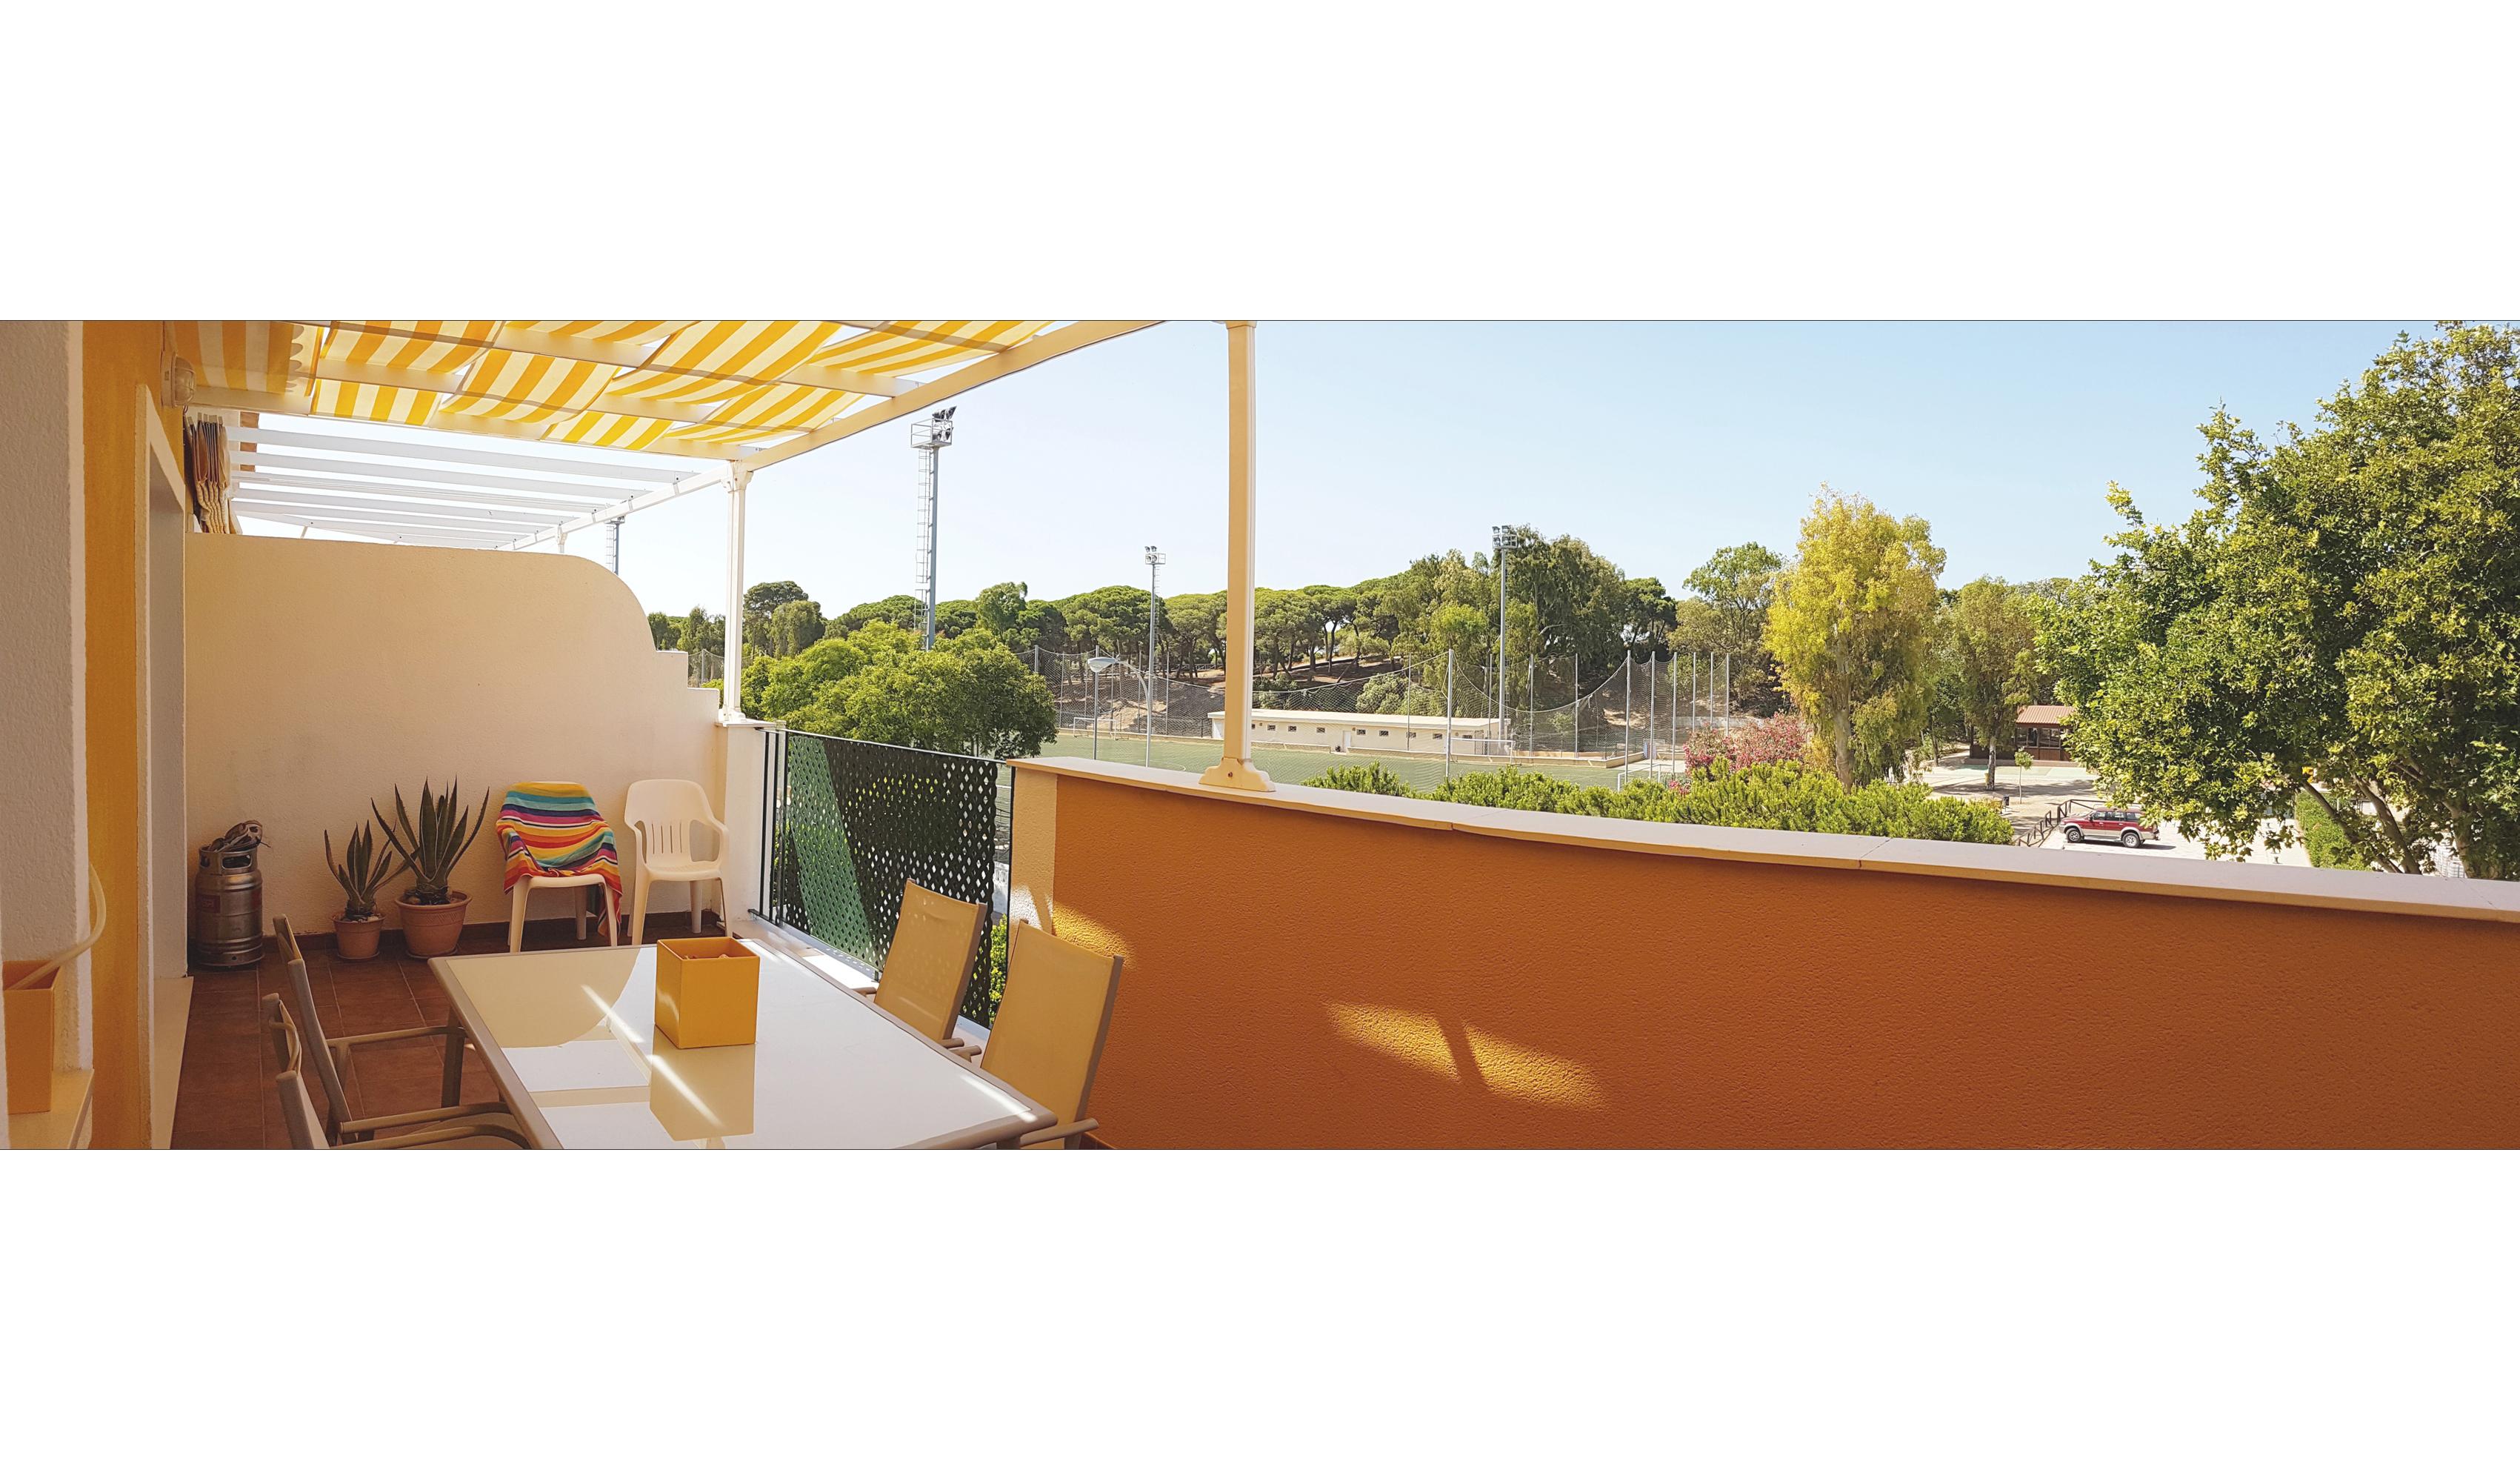 Alquiler 2 habitaciones rota cadiz espana av de la Alquiler de habitaciones en espana